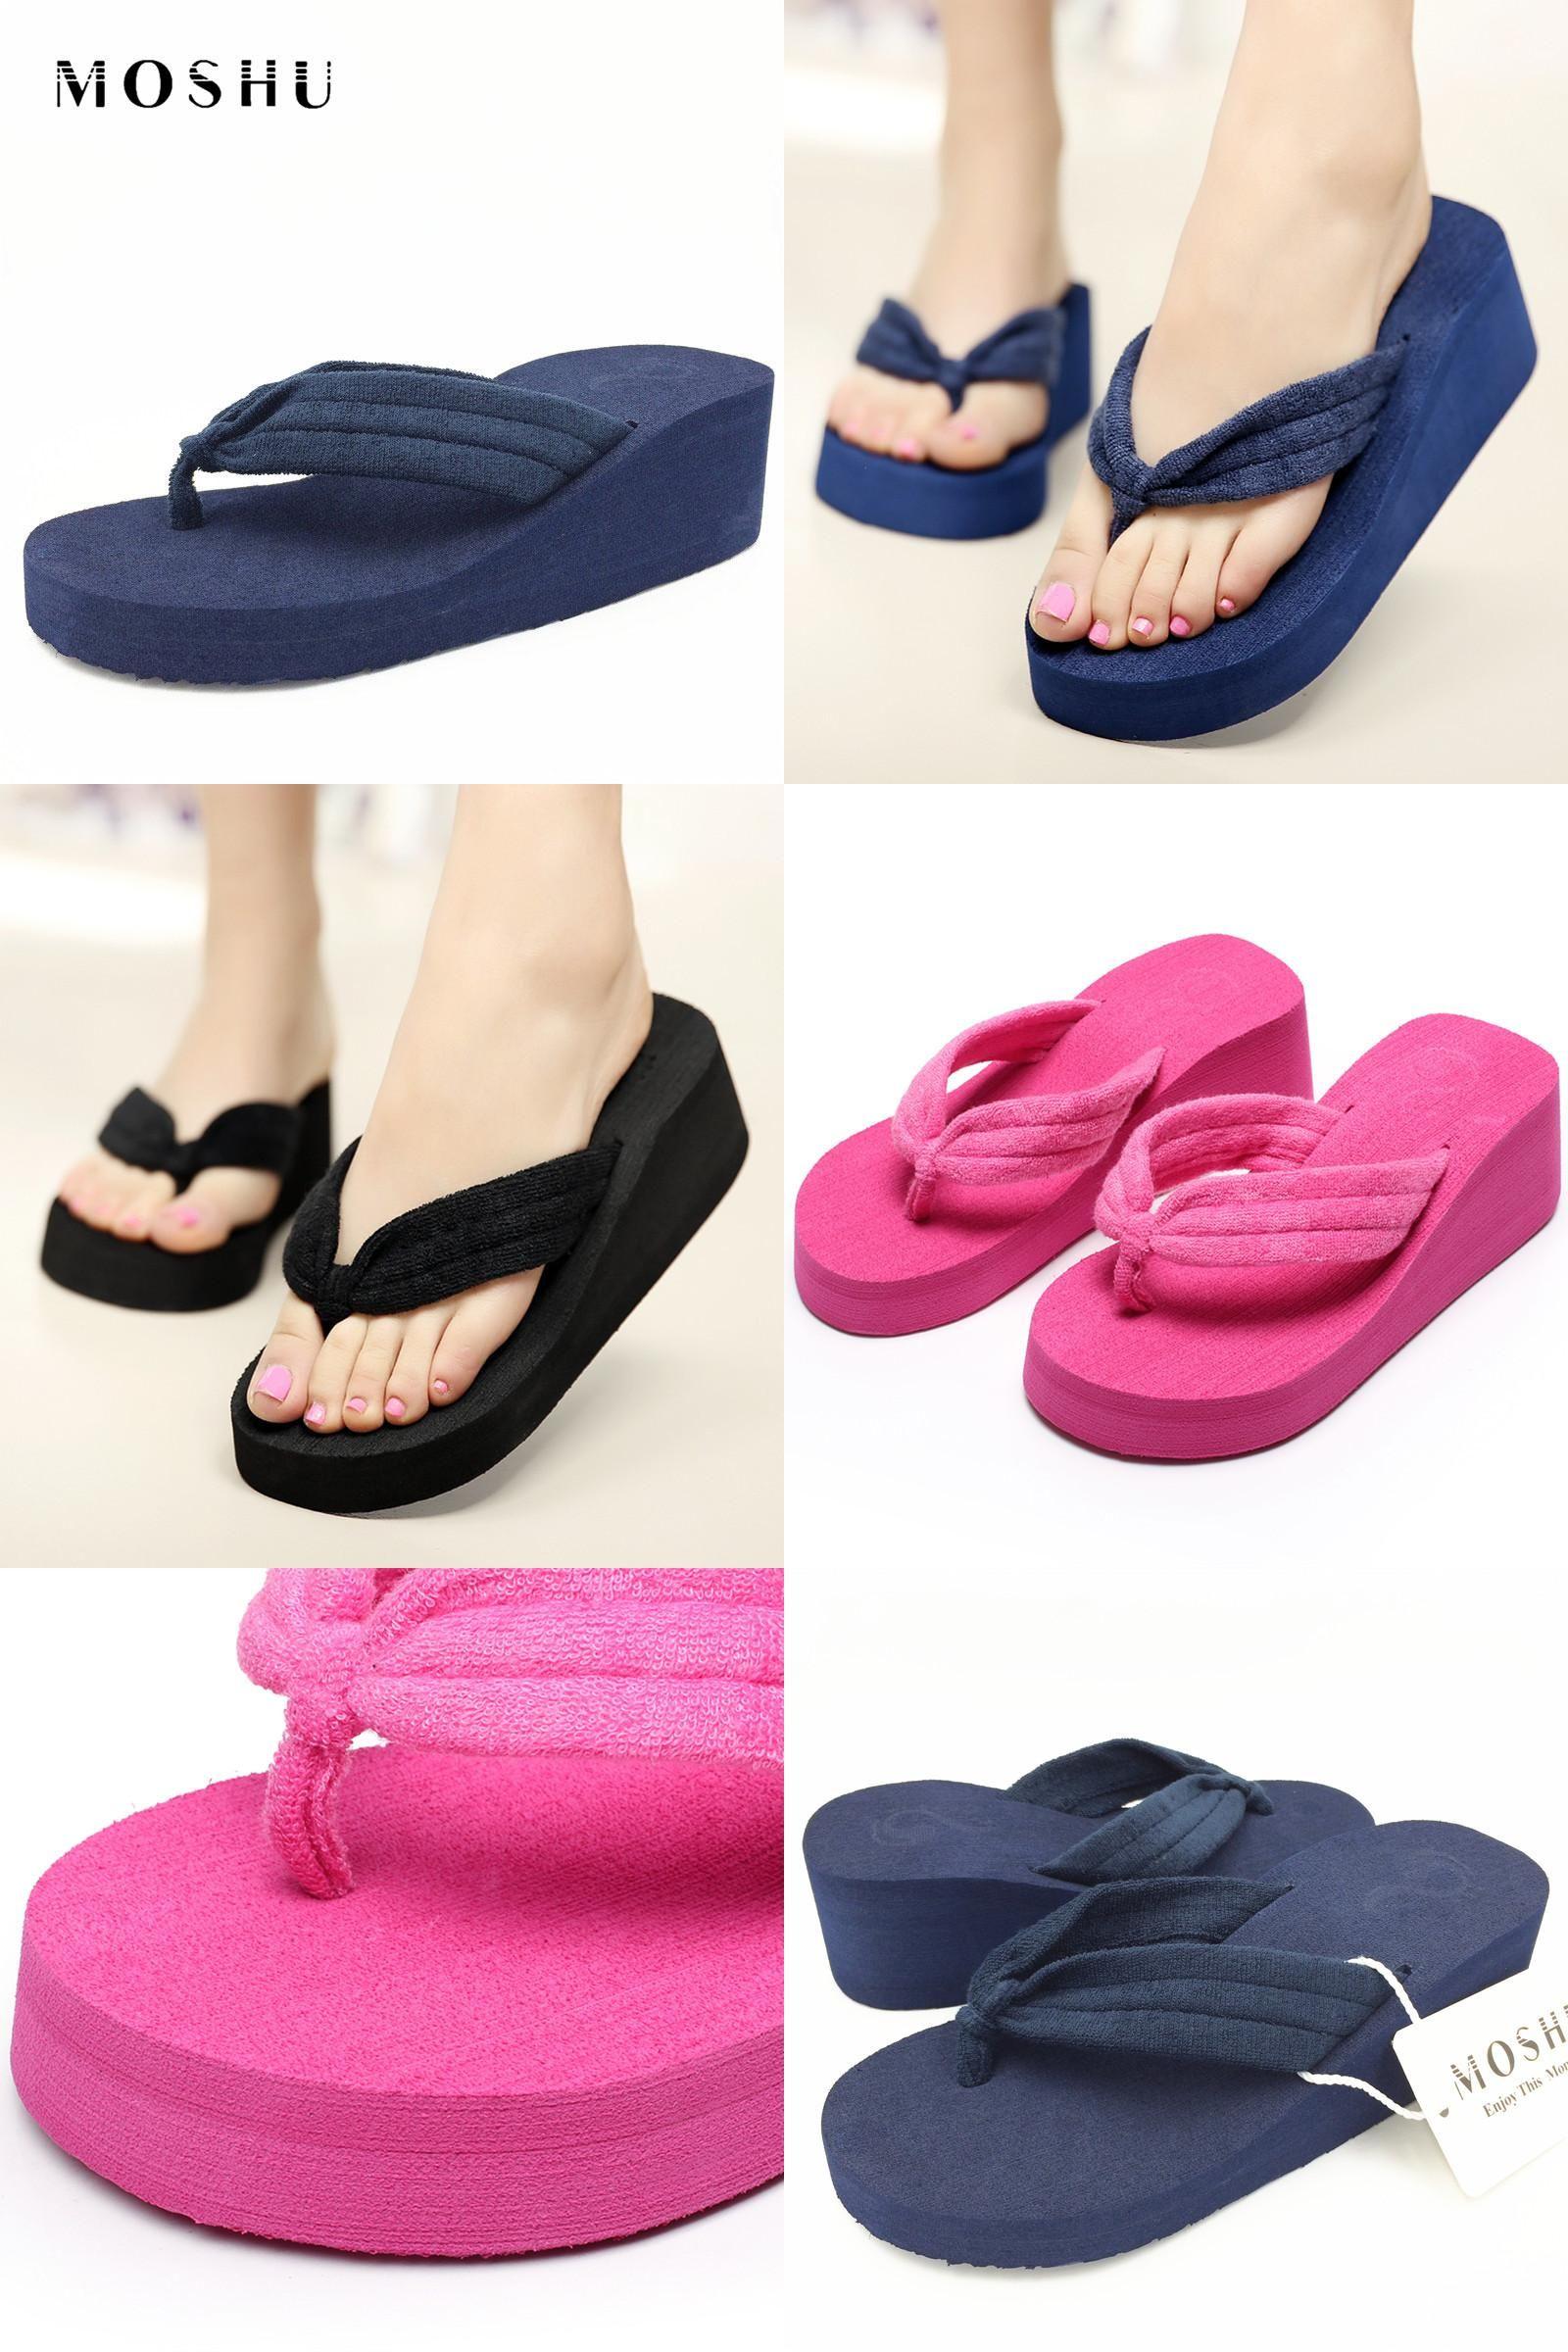 40136edc0ff [Visit to Buy] SIZE 42 Women Flip Flops Summer Wedges Platform Slippers  Beach Shoes Ladies Thick Heel Sandals Slides #Advertisement